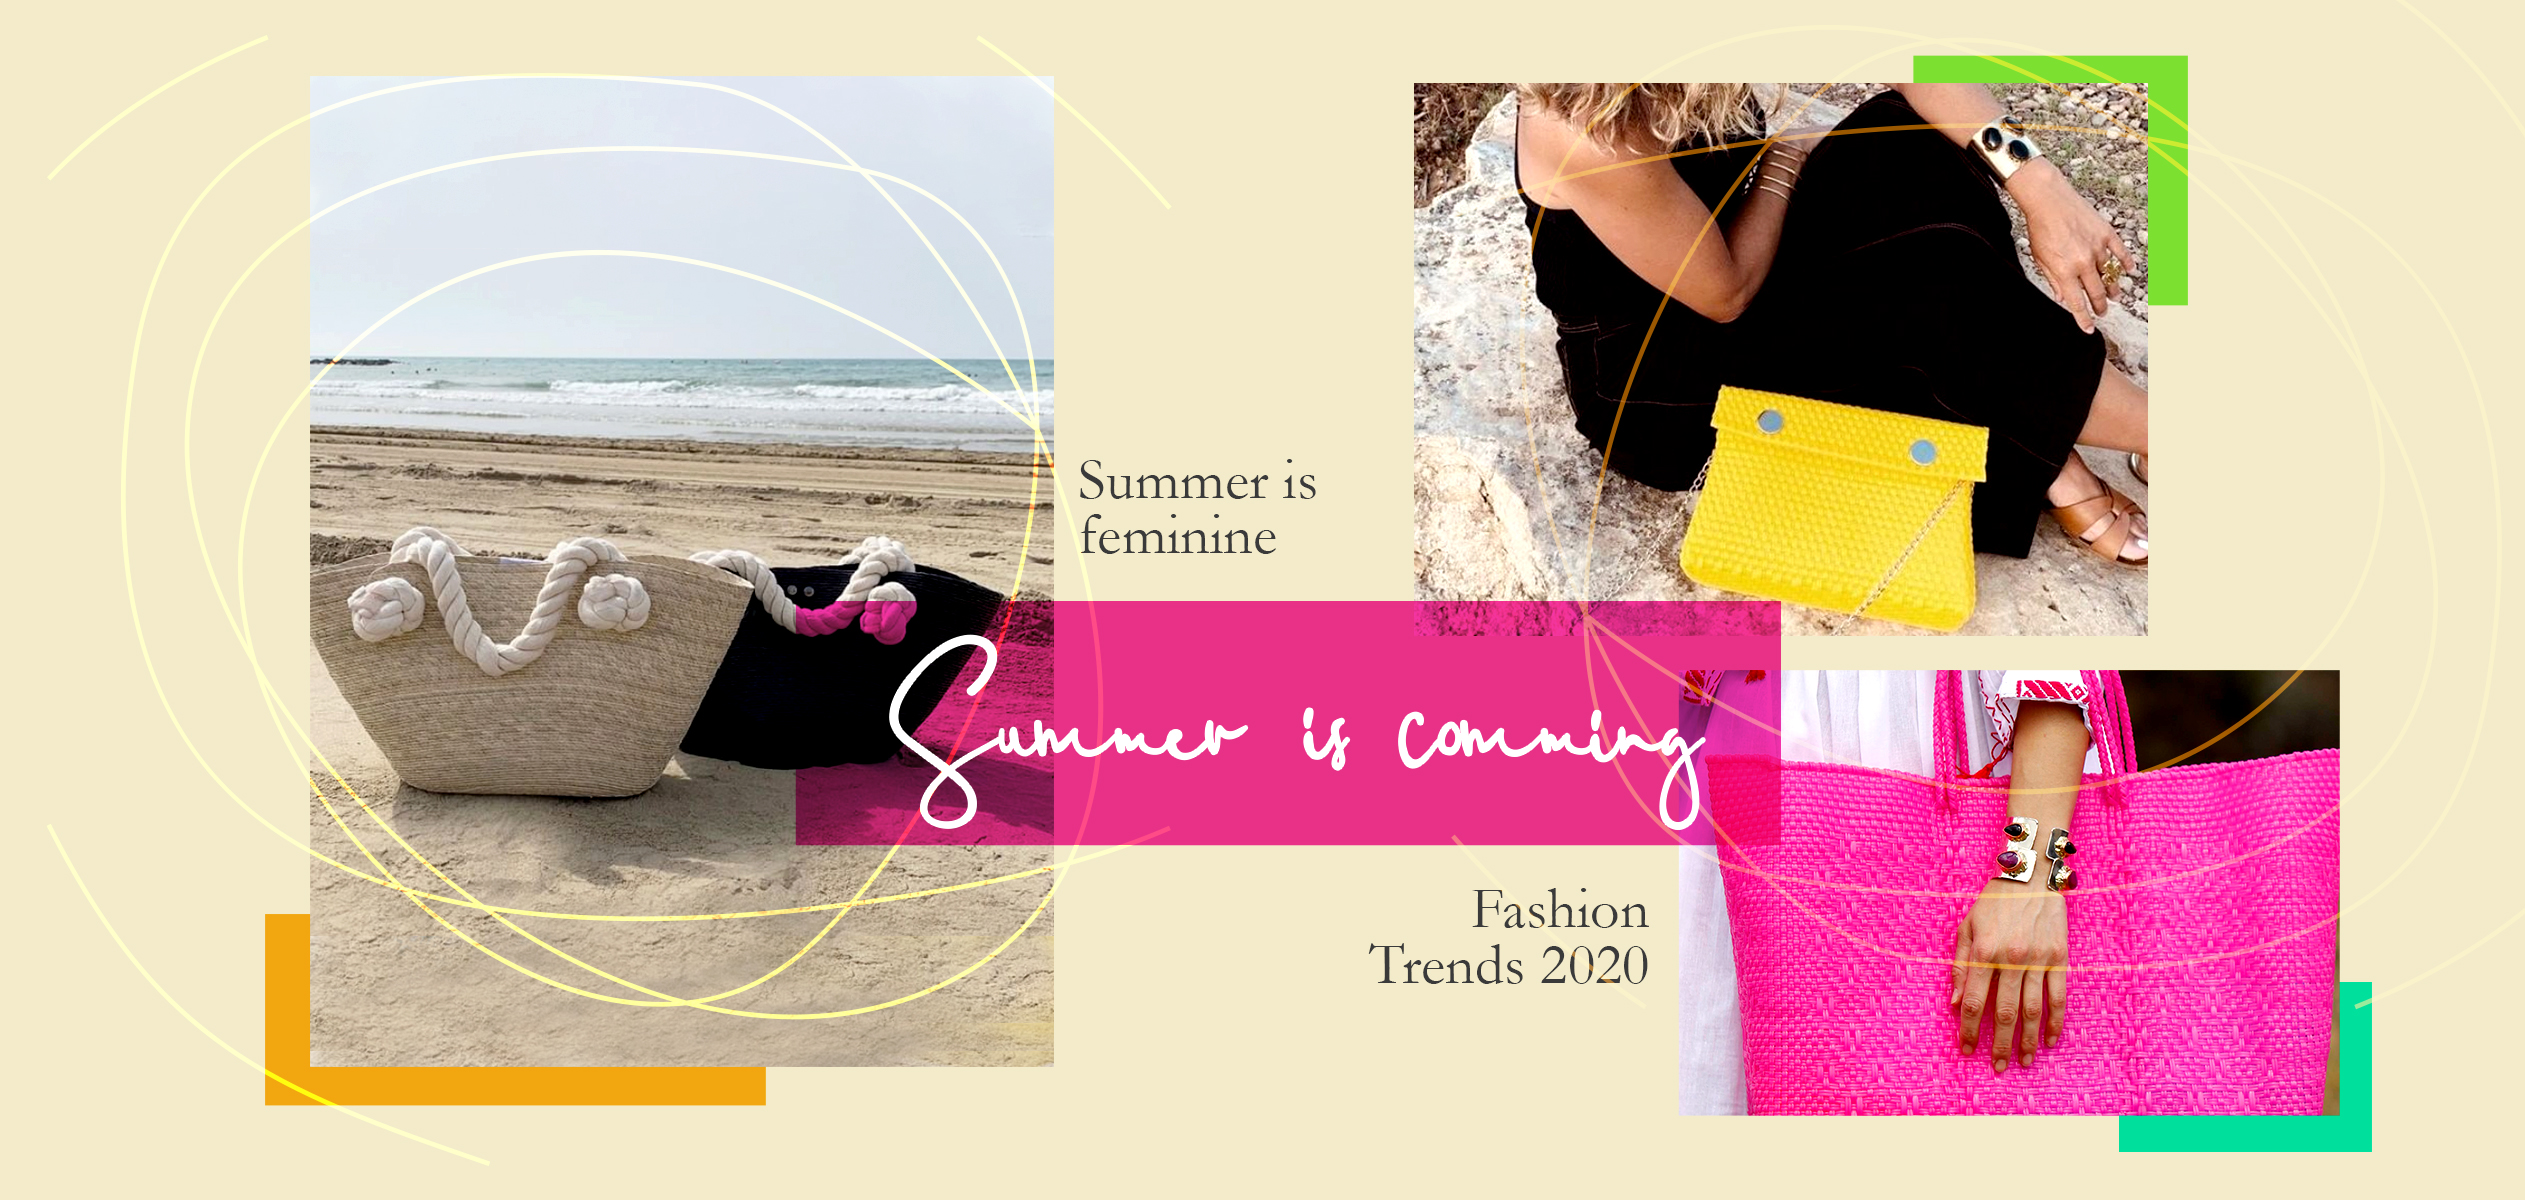 bolso plástico reciclados, fucsia, capazos, capazos nudo marinero, Pulsera piedras semipreciosas, accesorio, fashion, moda, fashion, complementos 2020